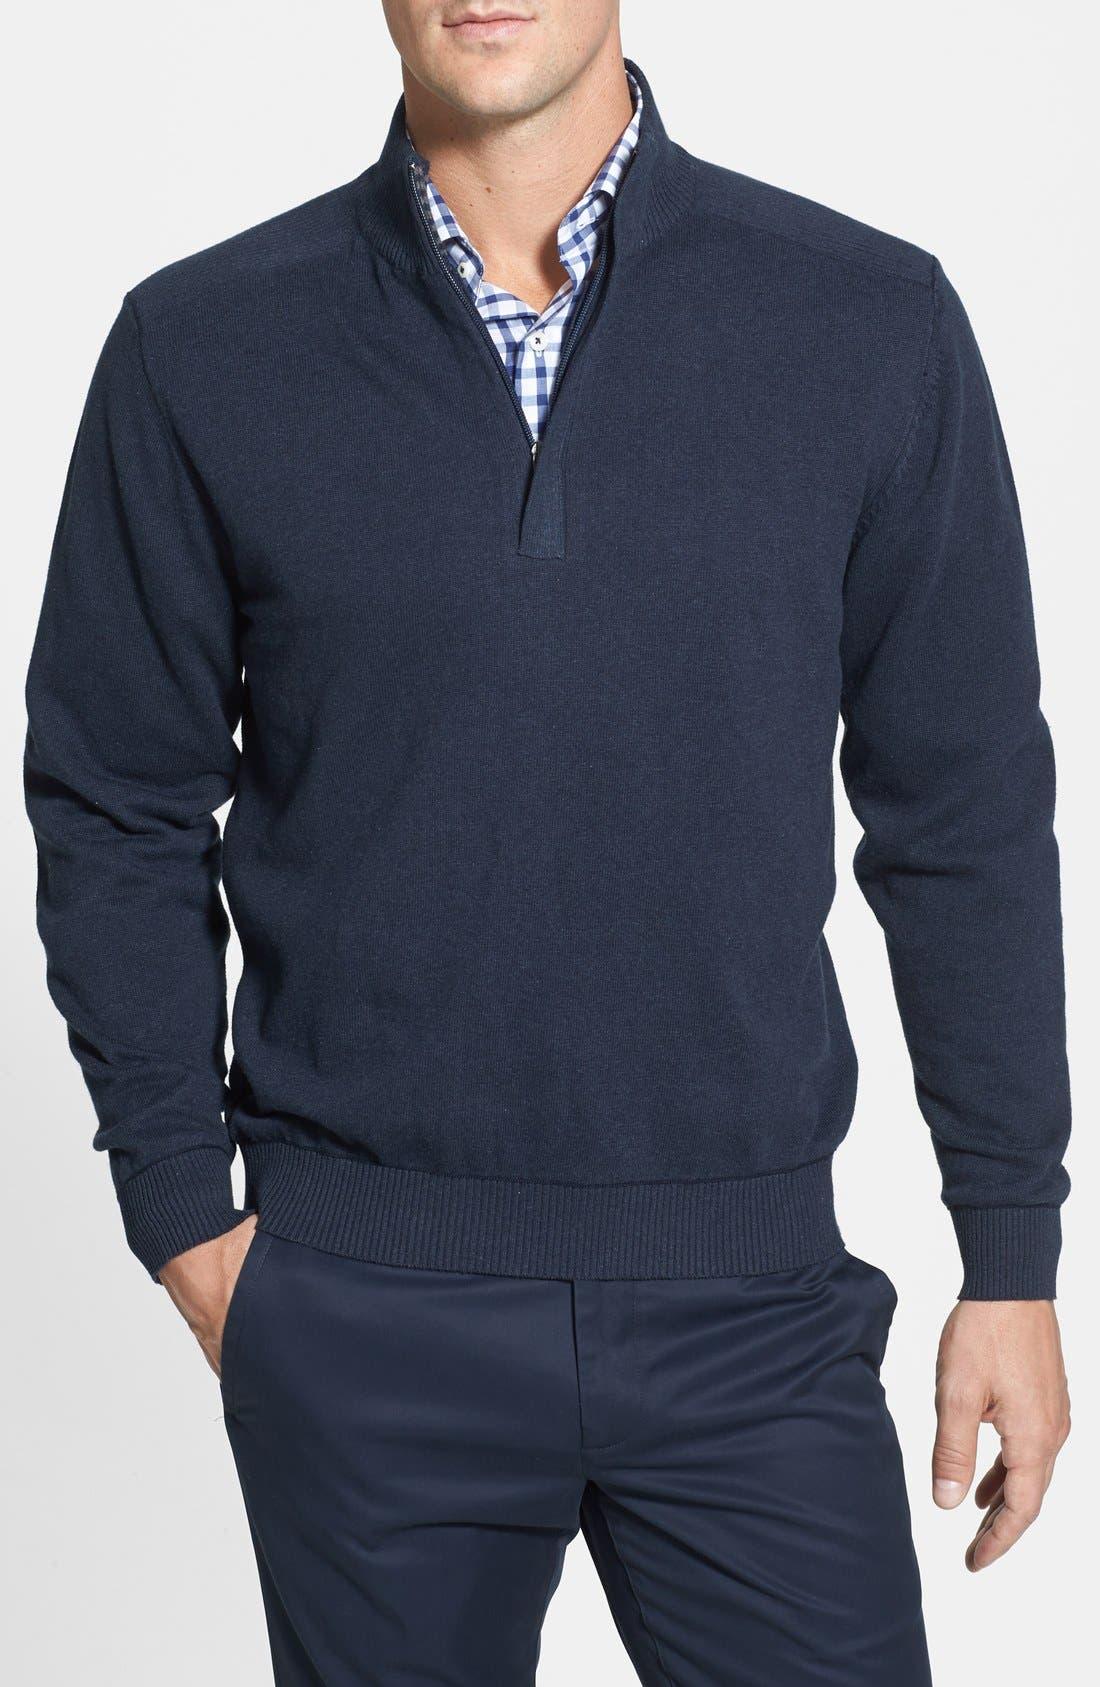 CUTTER & BUCK Broadview Half Zip Sweater, Main, color, 480